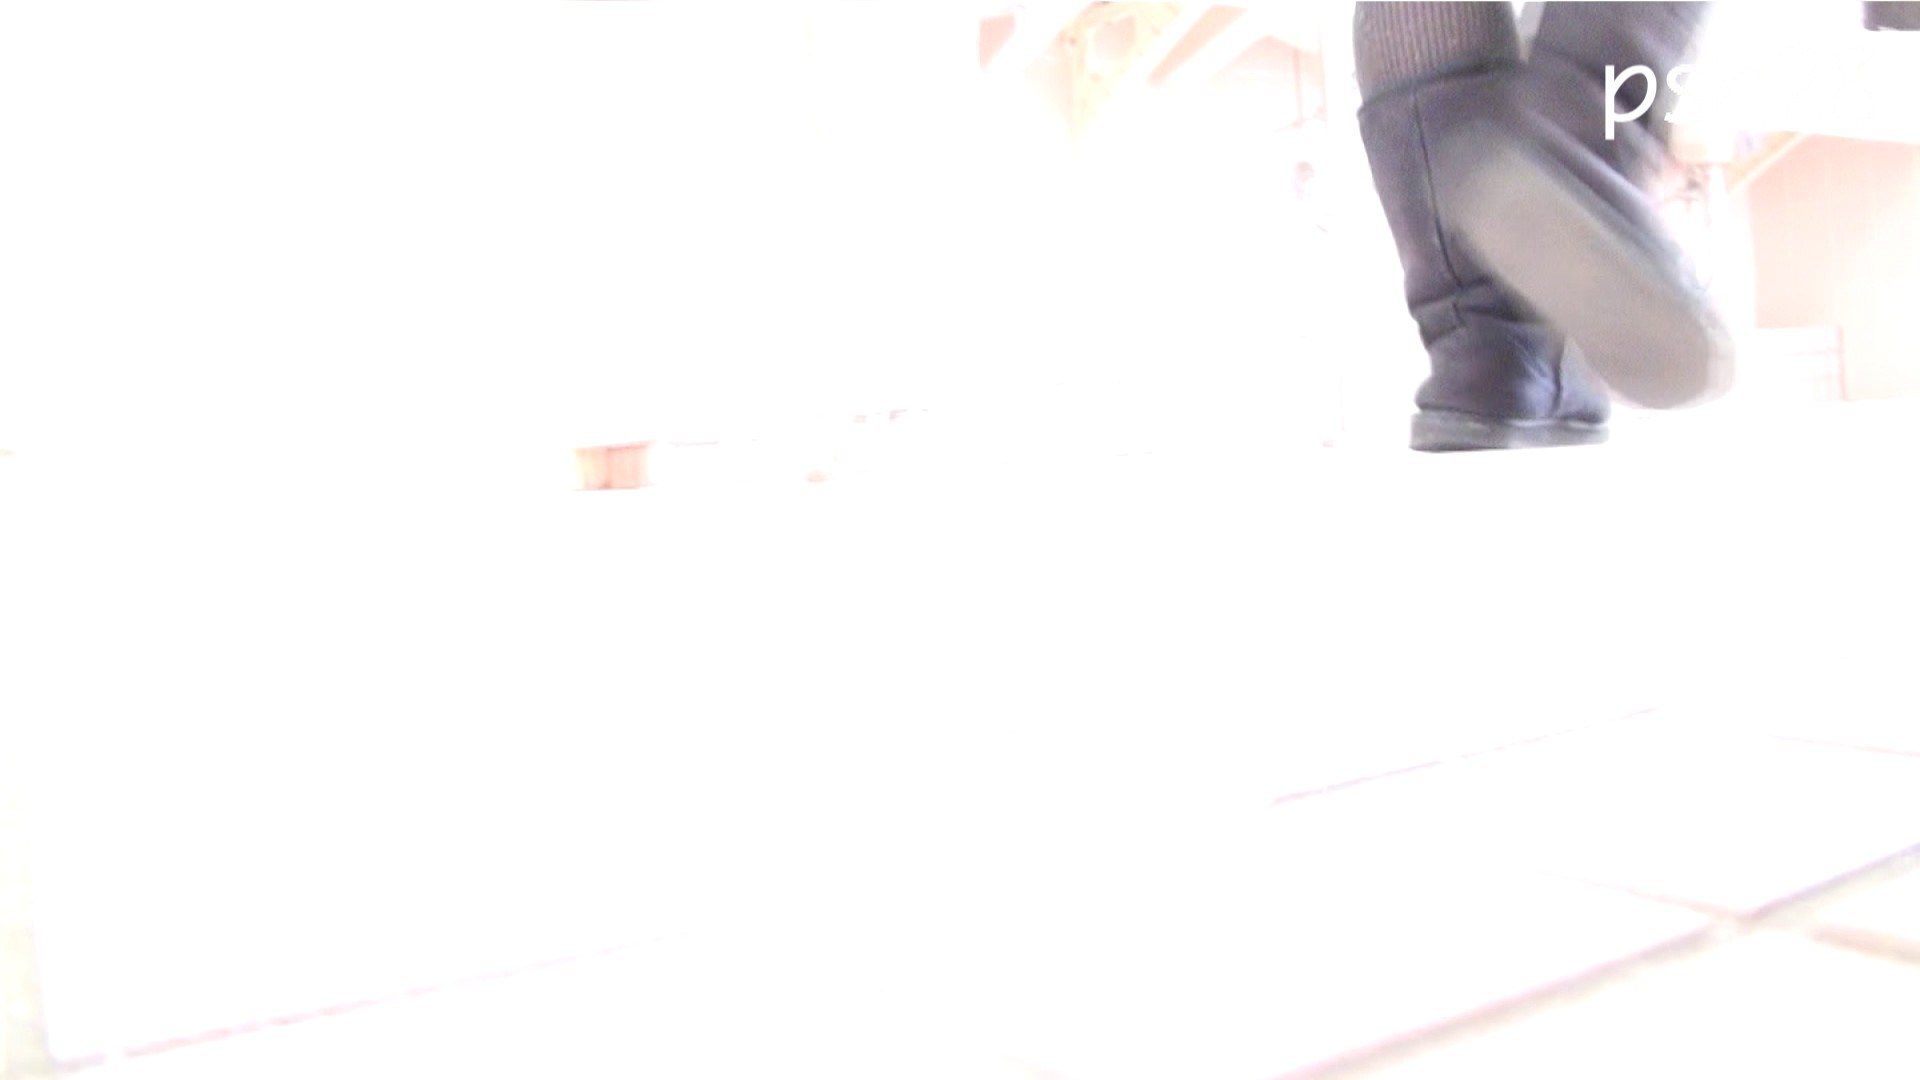 ▲復活限定▲ハイビジョン 盗神伝 Vol.28 洗面所 SEX無修正画像 69画像 4